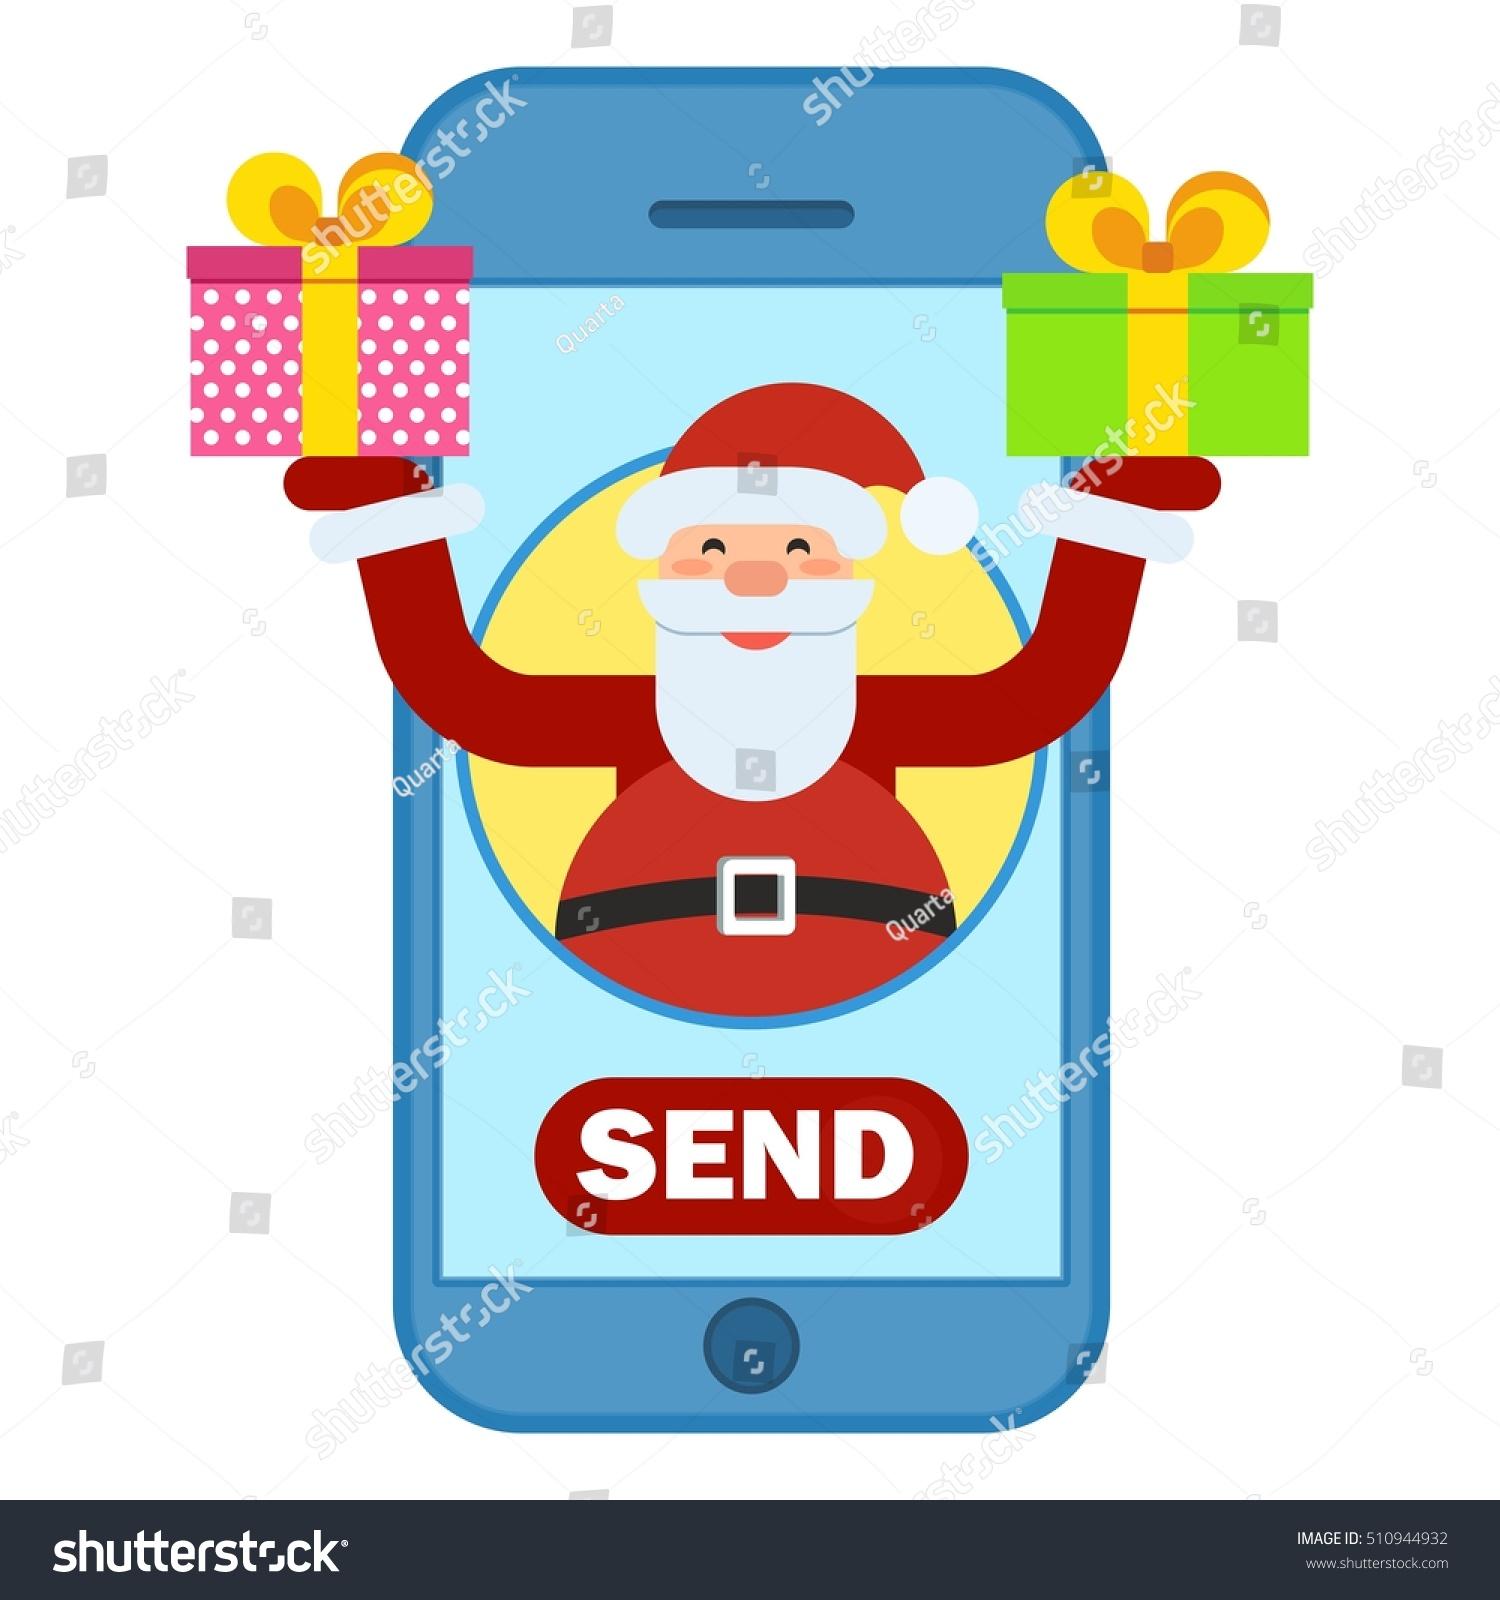 Santa Claus Sending Christmas Gifts Via Stock Vector (Royalty Free ...